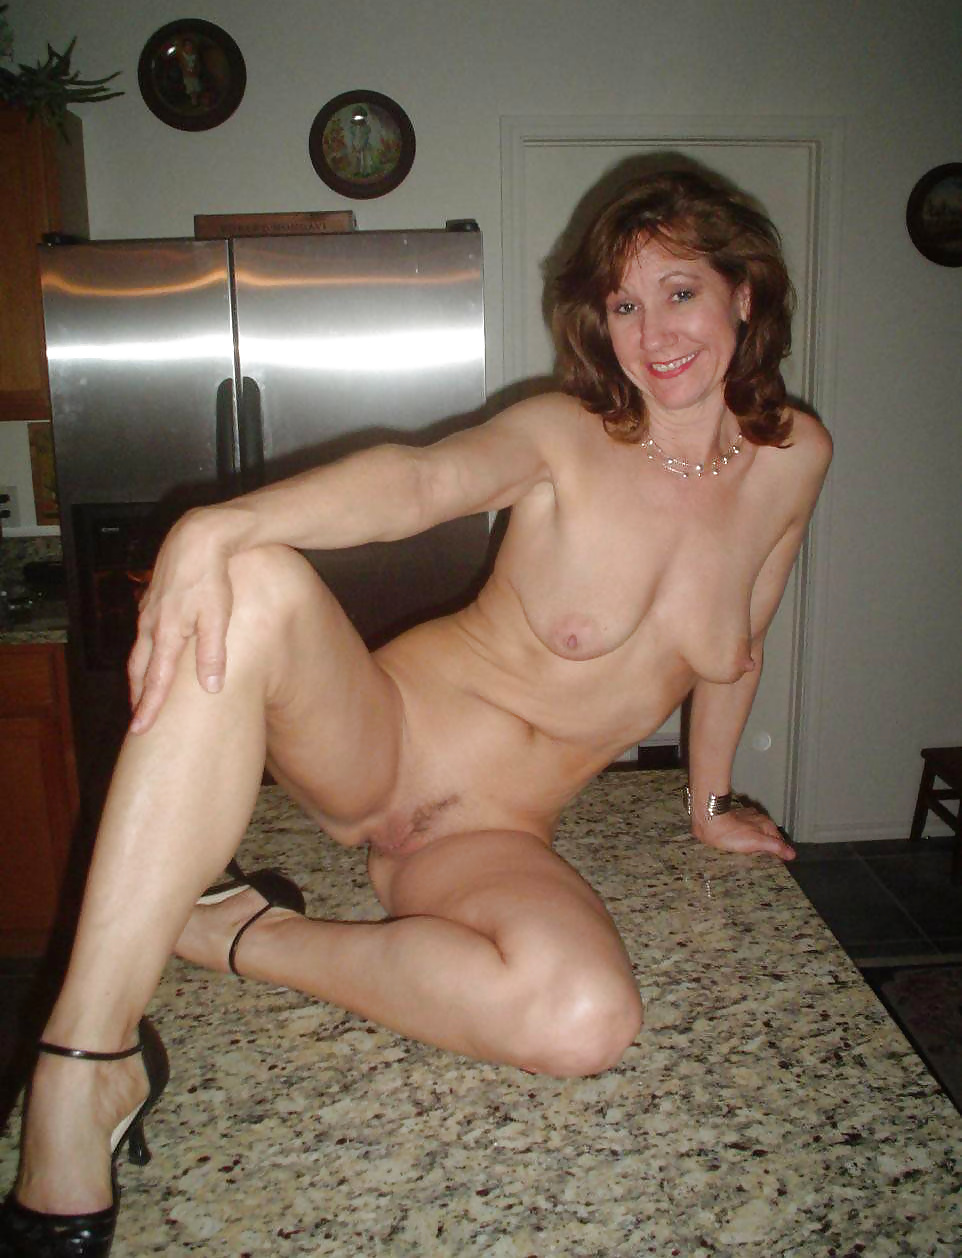 Granny porn picts fucking pics